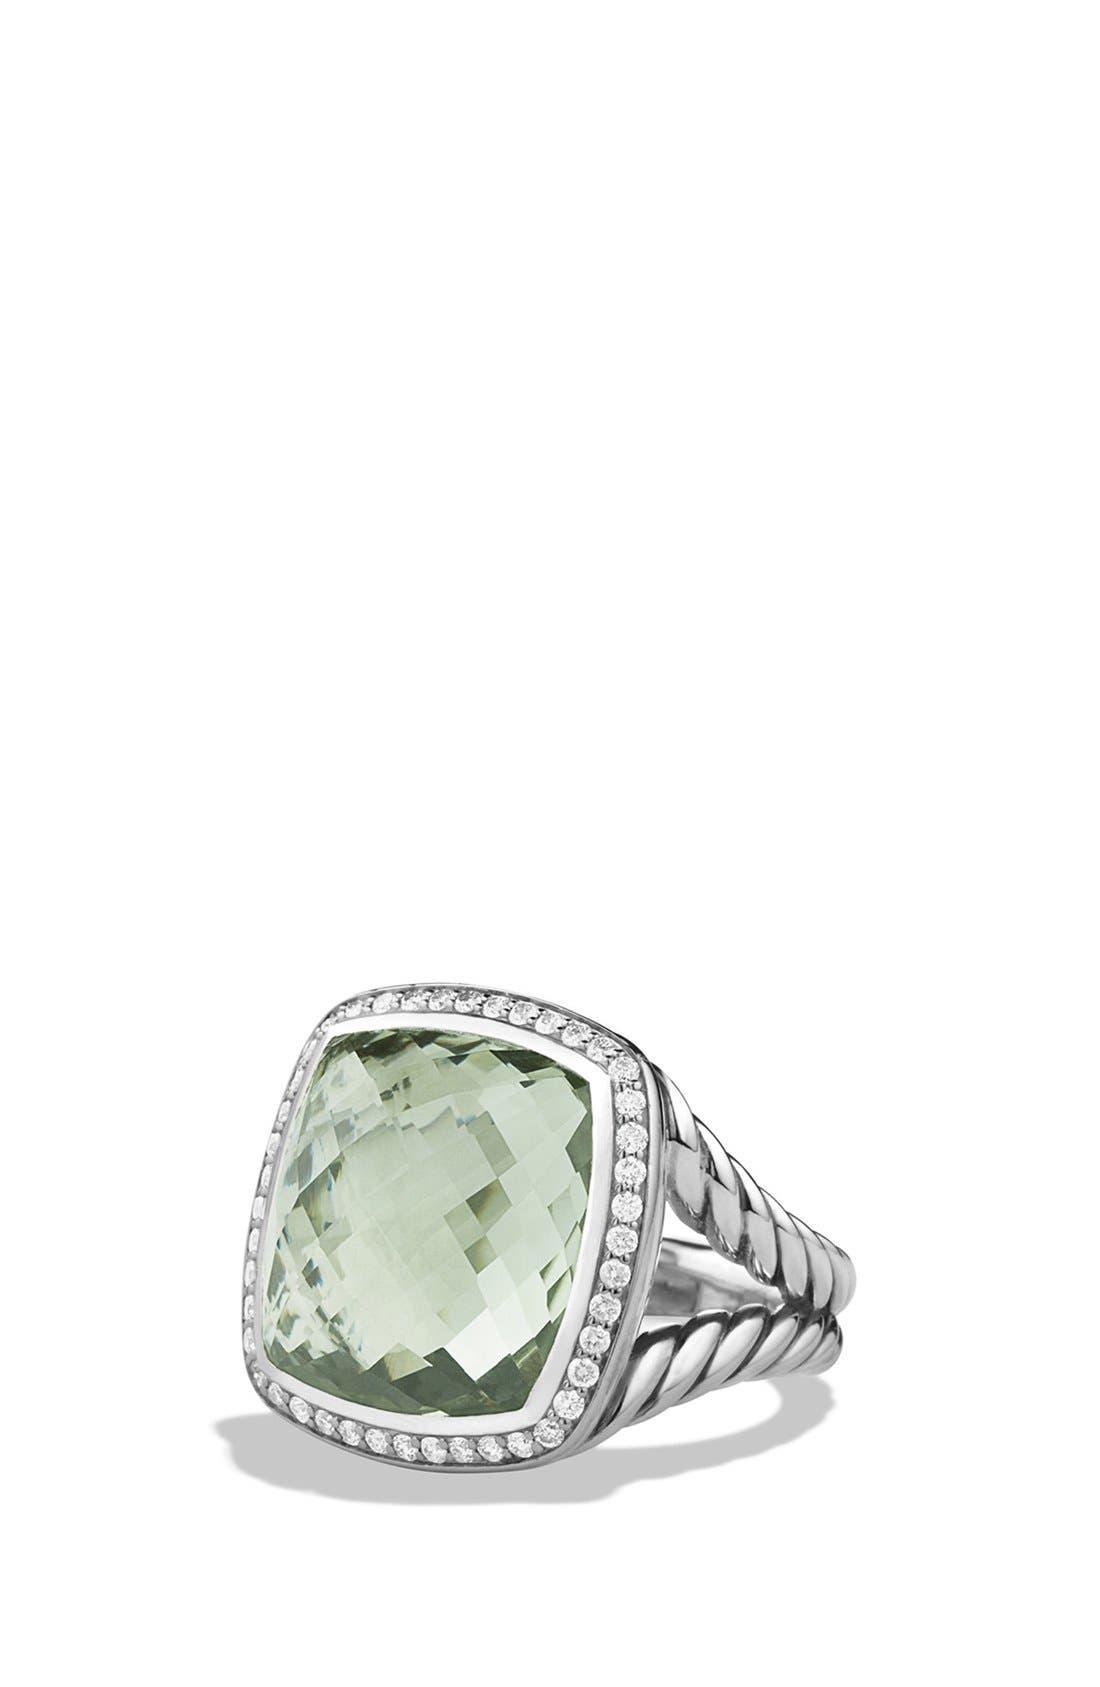 Main Image - David Yurman 'Albion' Ring with Diamonds